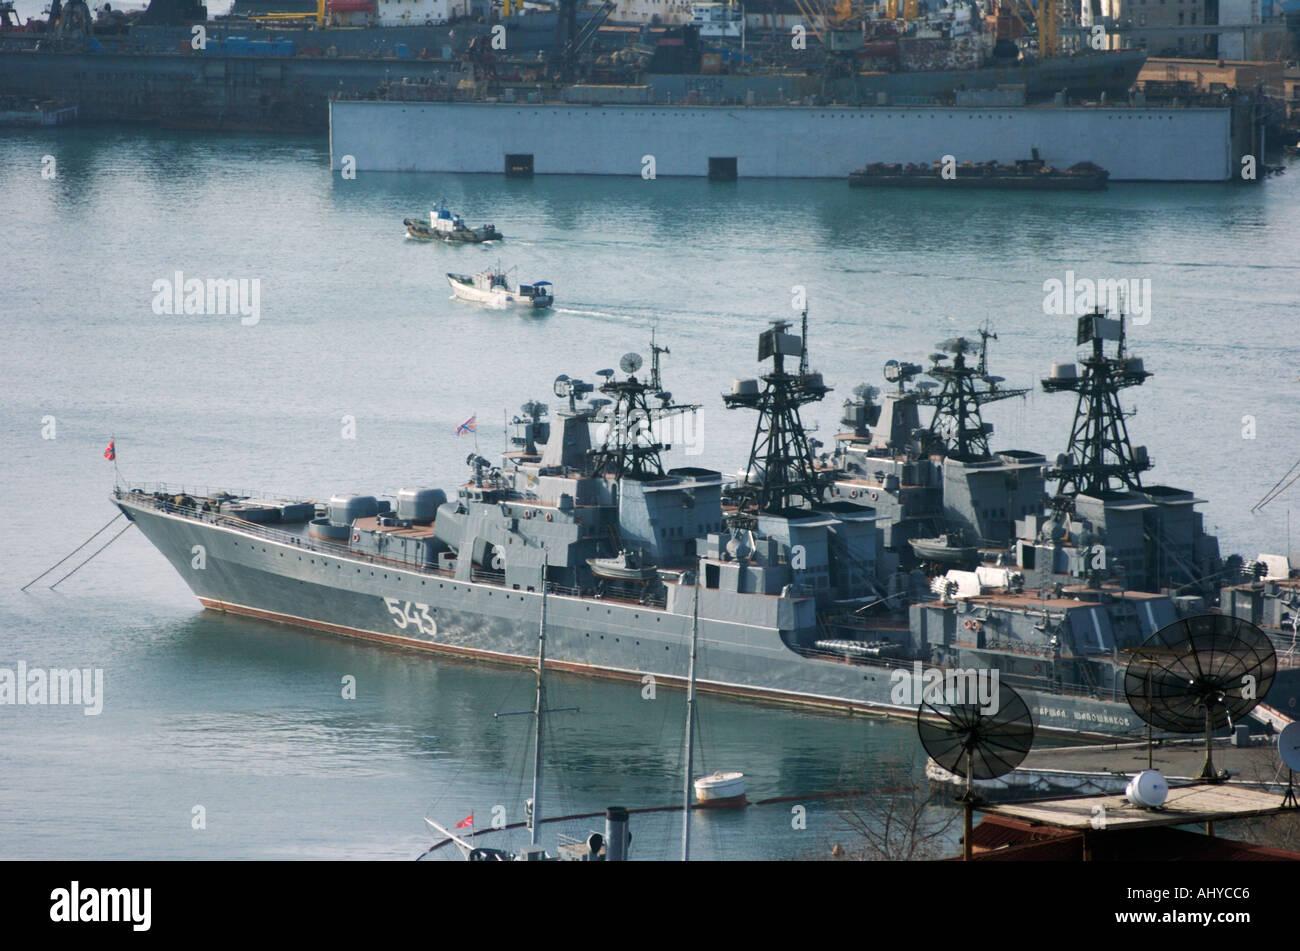 Warships of the Russian Pacific Fleet tied up in Vladivostok Harbour in Russia 2004 - Stock Image